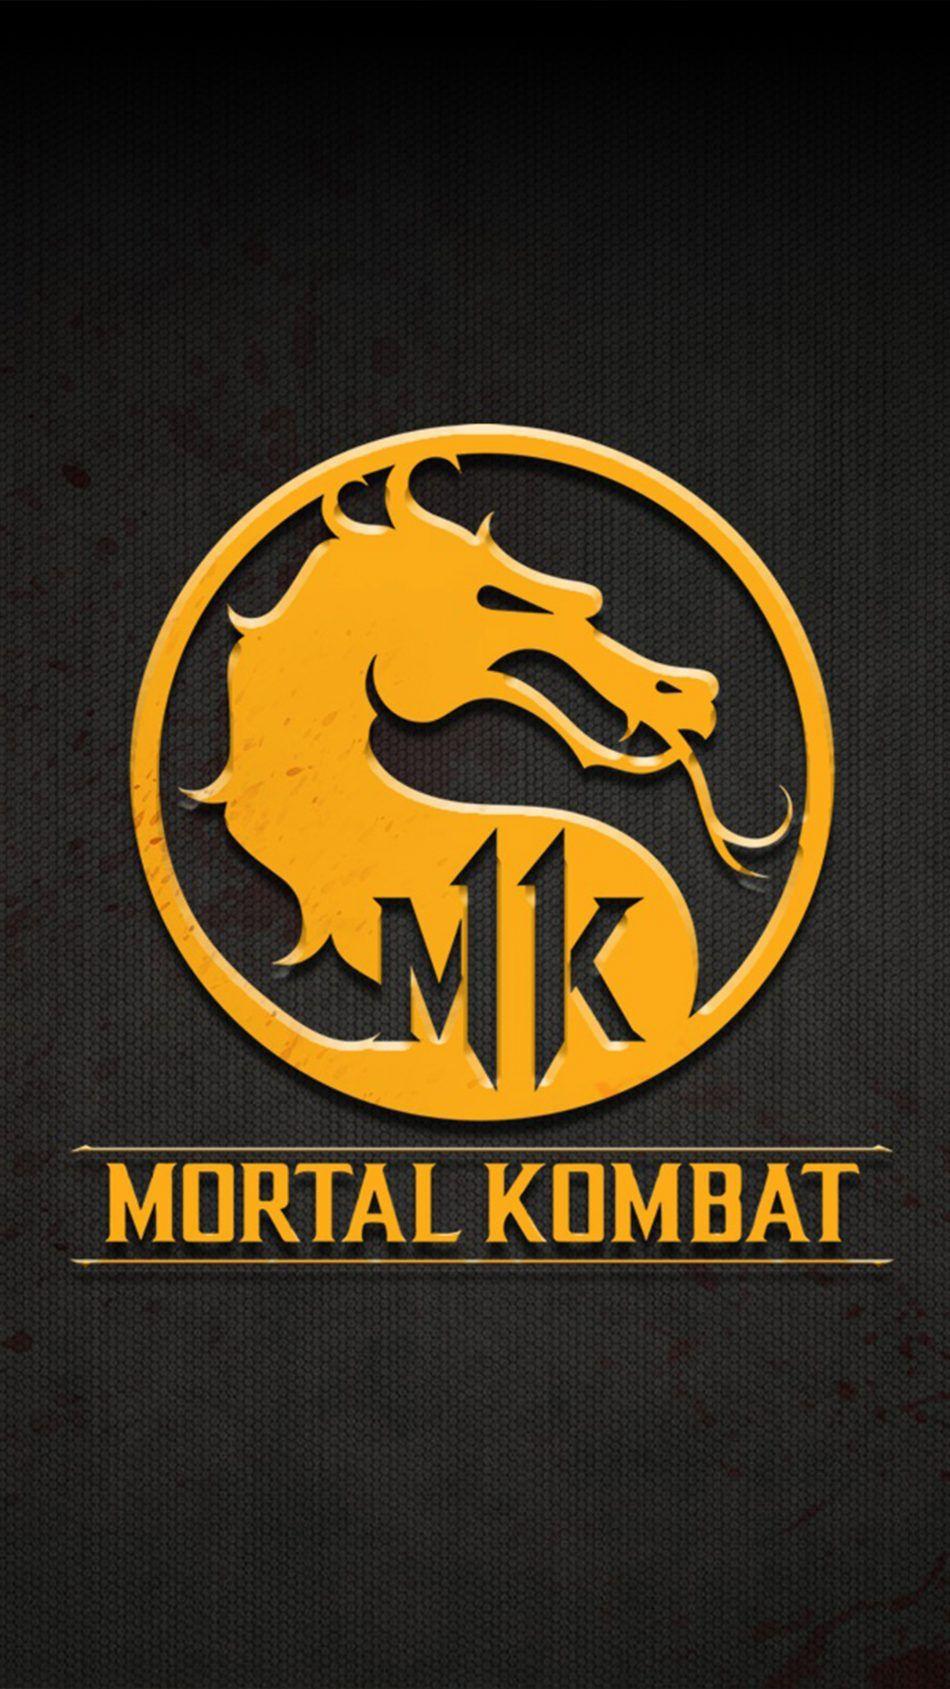 Mortal Kombat 11 Logo 4k Ultra Hd Mobile Wallpaper Mortalkombat Game Logotipos Retro Mortal Combate Desenho Jogos De Lutas